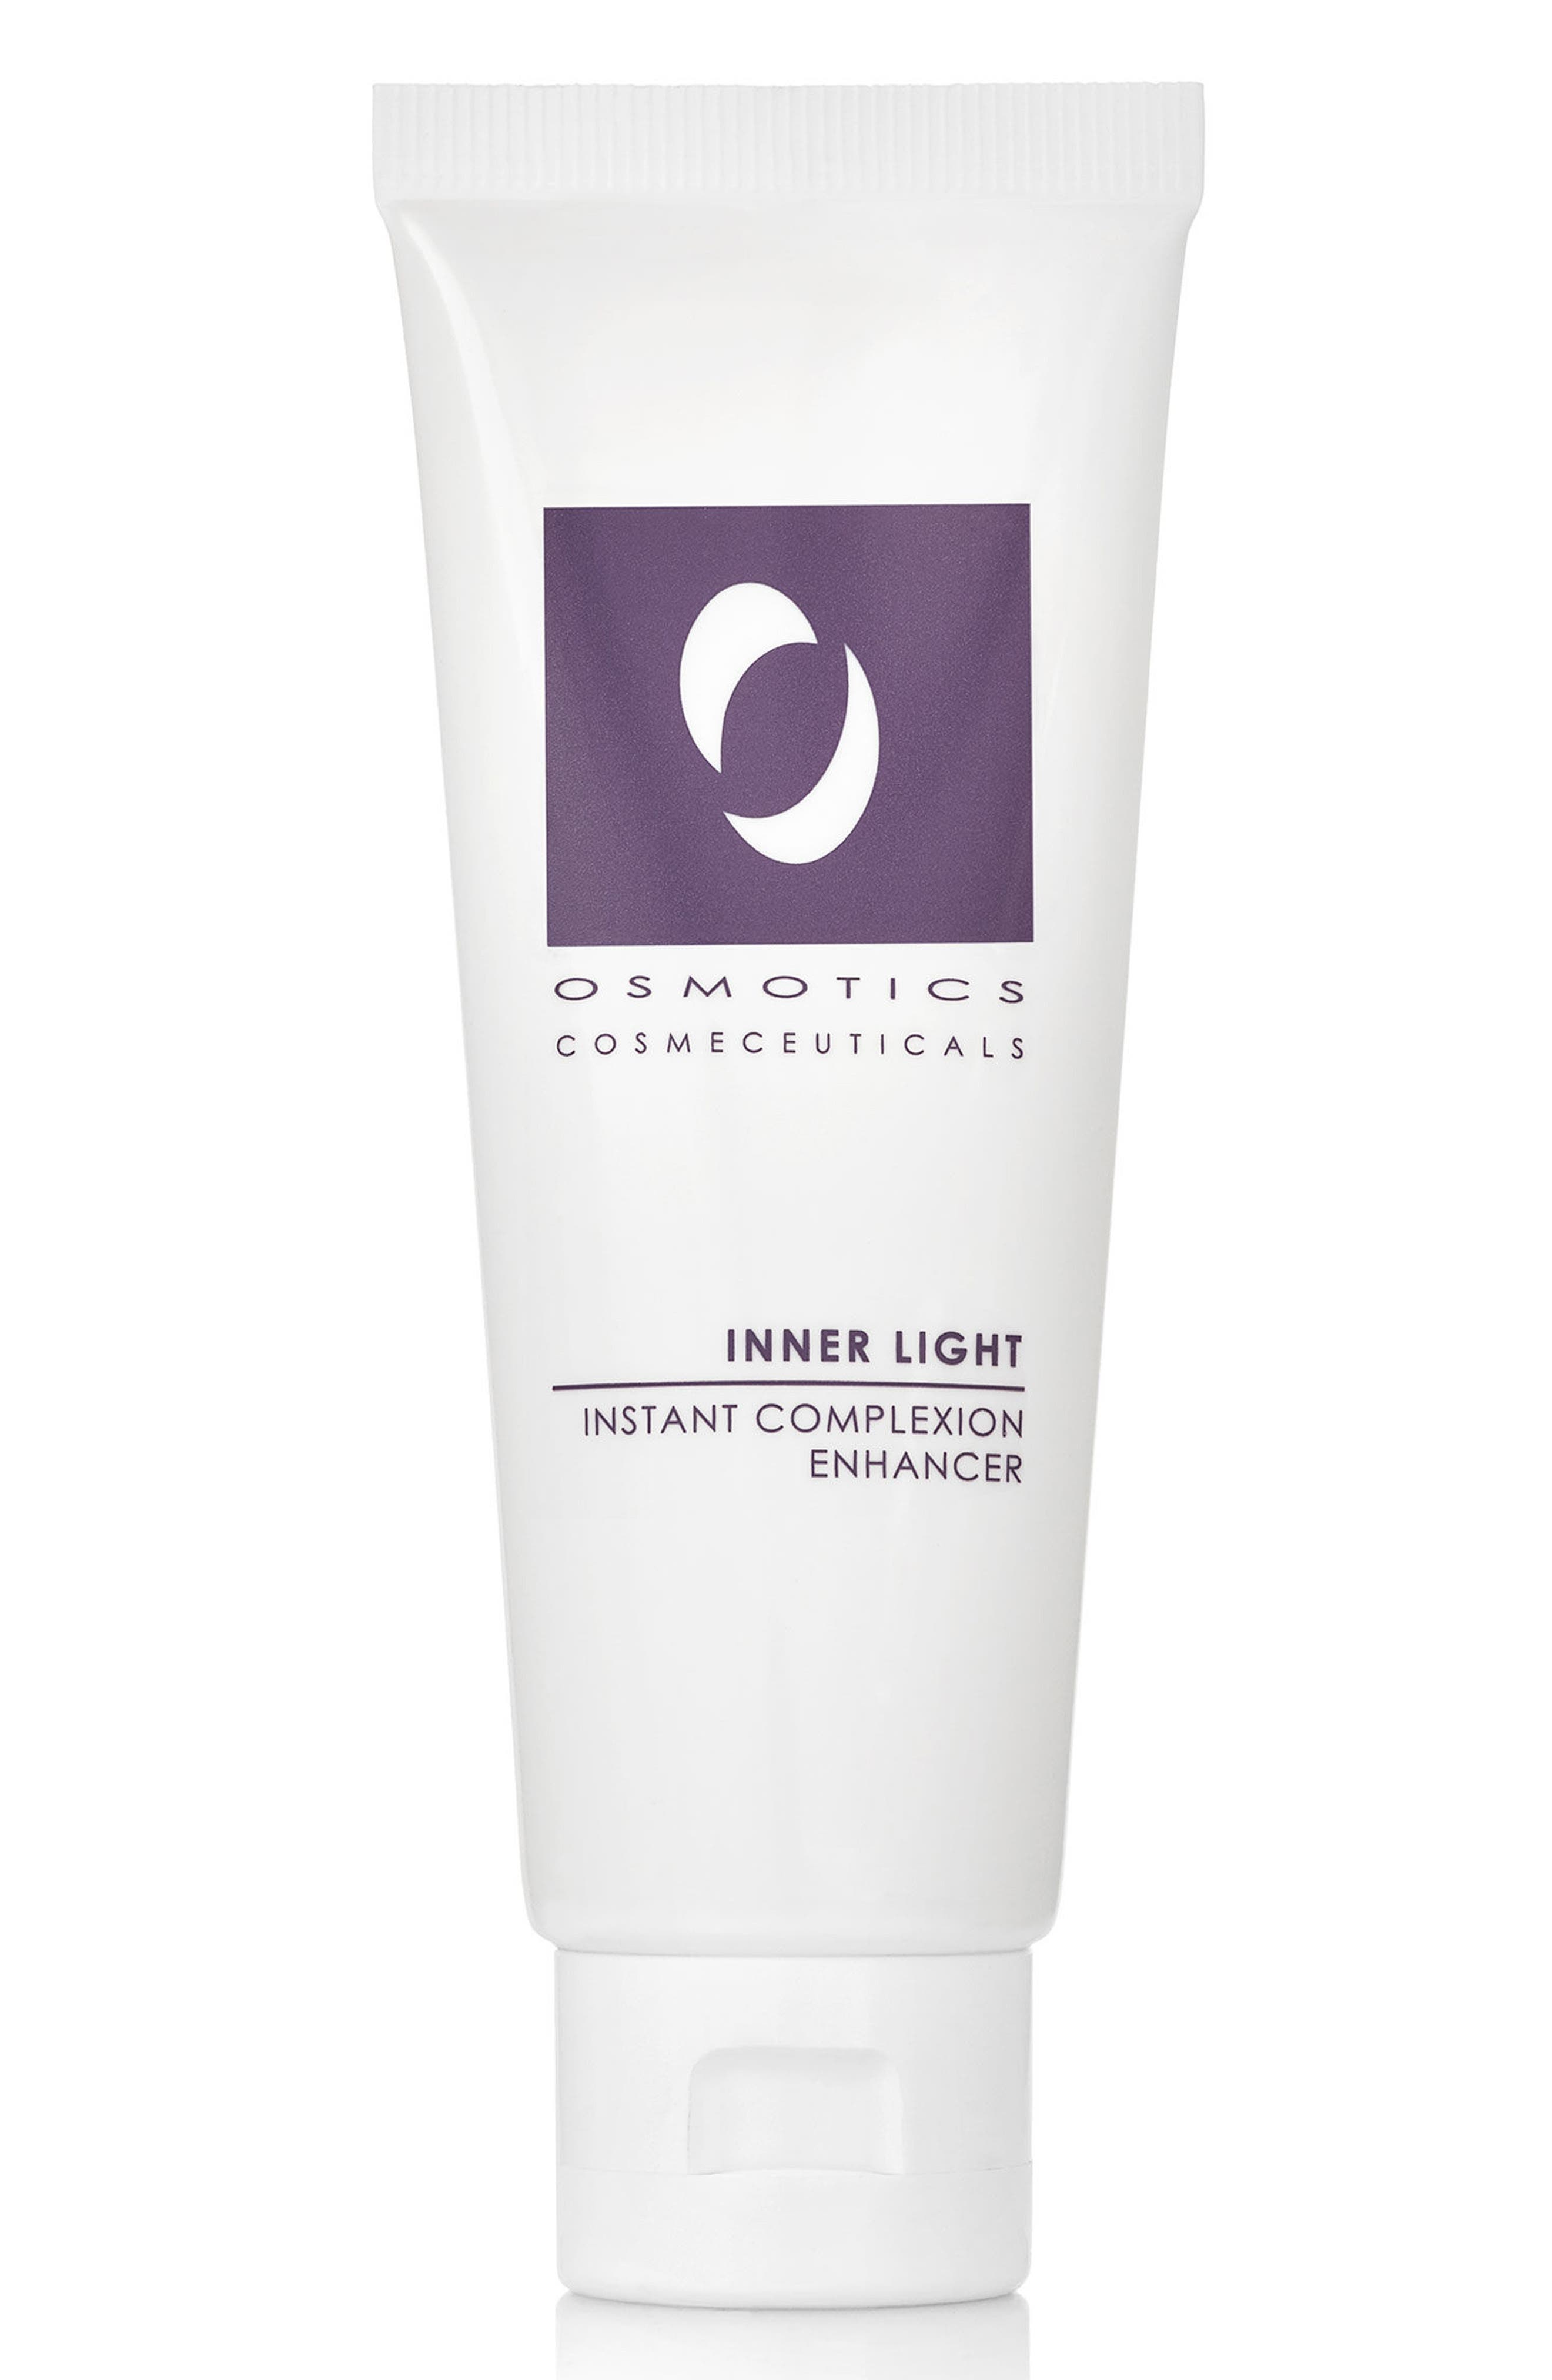 Osmotics Cosmeceuticals Inner Light Instant Complexion Enhancer